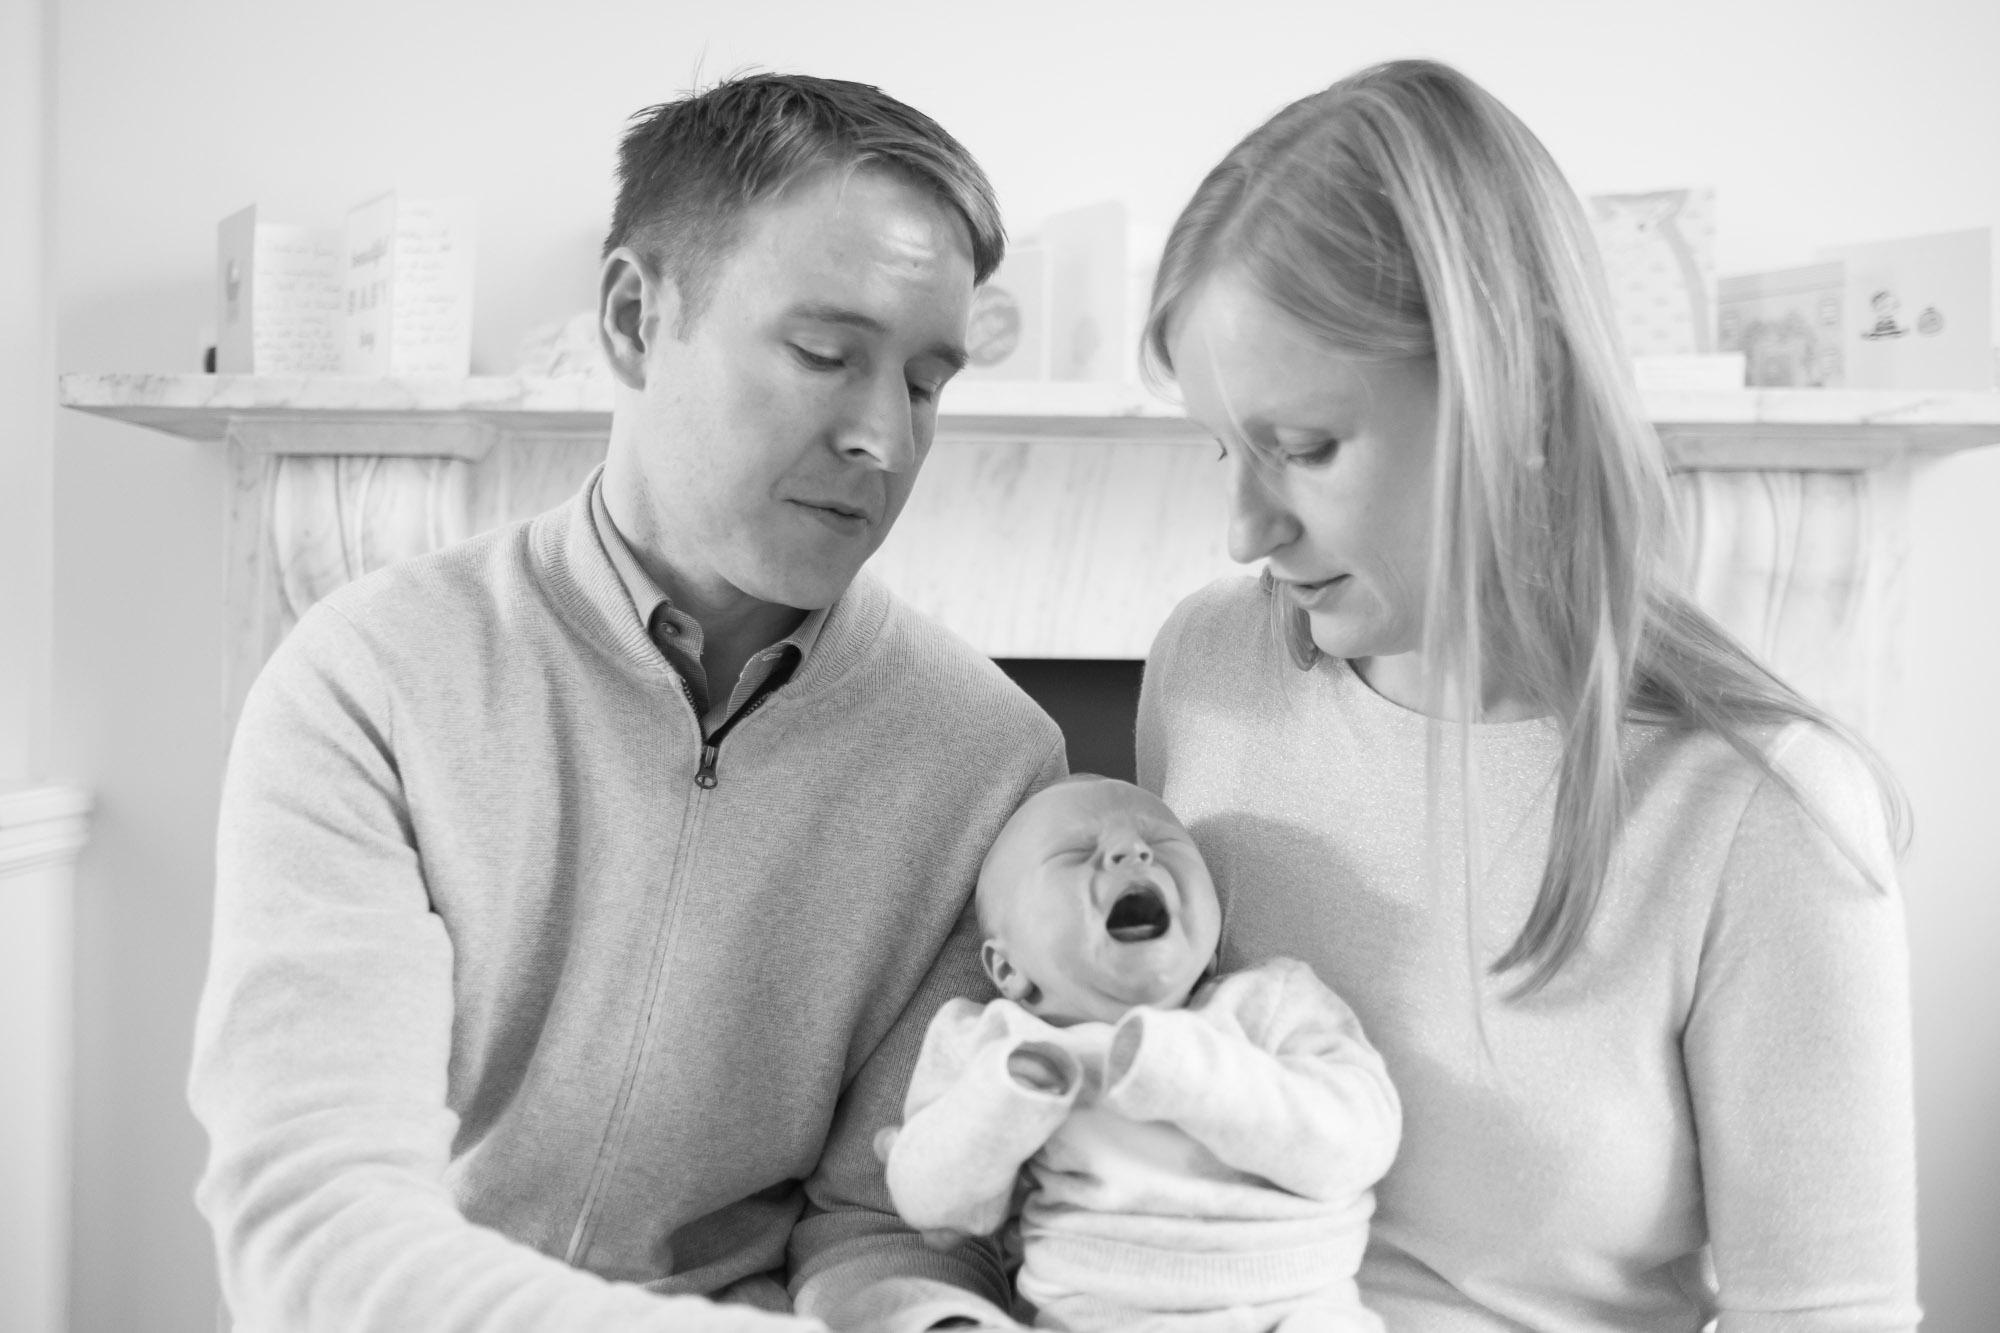 newborn-baby-family-portrait-photographer-063.jpg